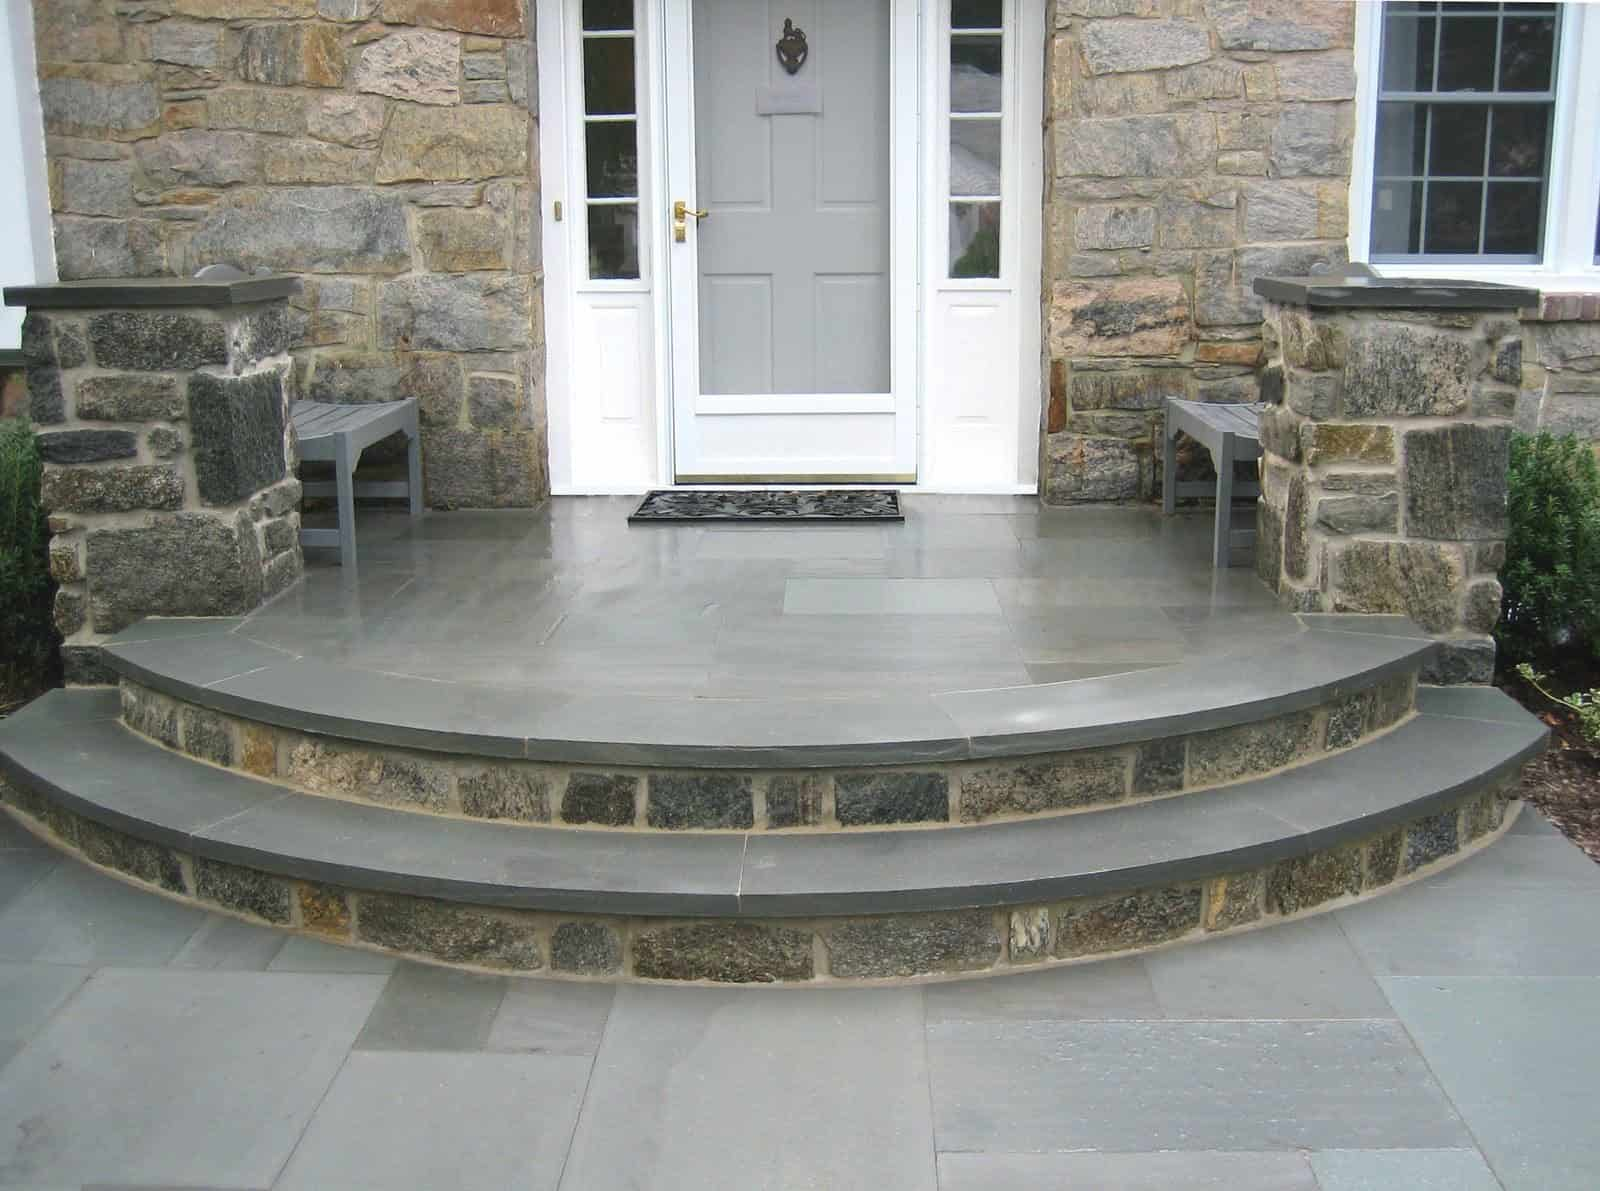 Natural Stone Stoop - 1 inch Thermal Bluestone Walkway and Stoop - Random Pattern - Merrick, Long Island NY